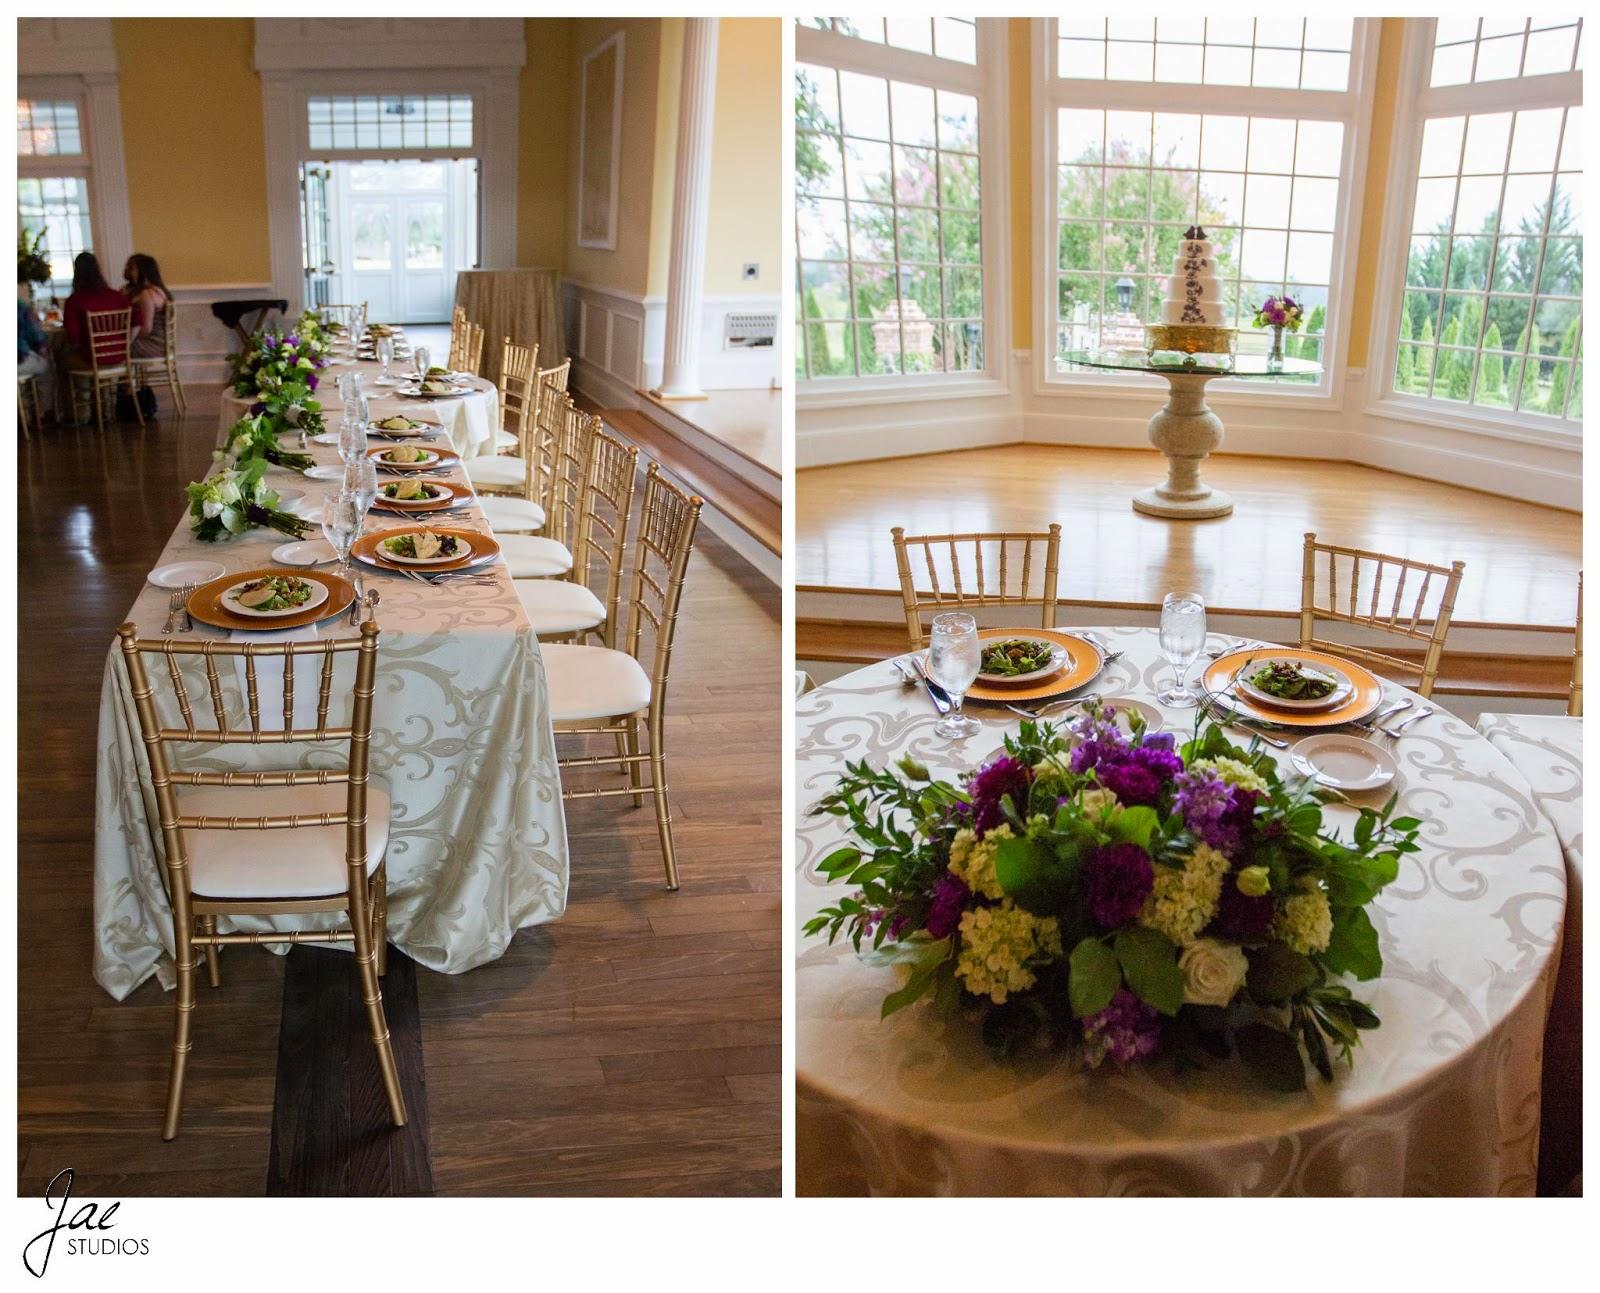 Jonathan and Julie, Bird cage, West Manor Estate, Wedding, Lynchburg, Virginia, Jae Studios, table, flowers, purple, green, cake, chairs, wedding party, windows